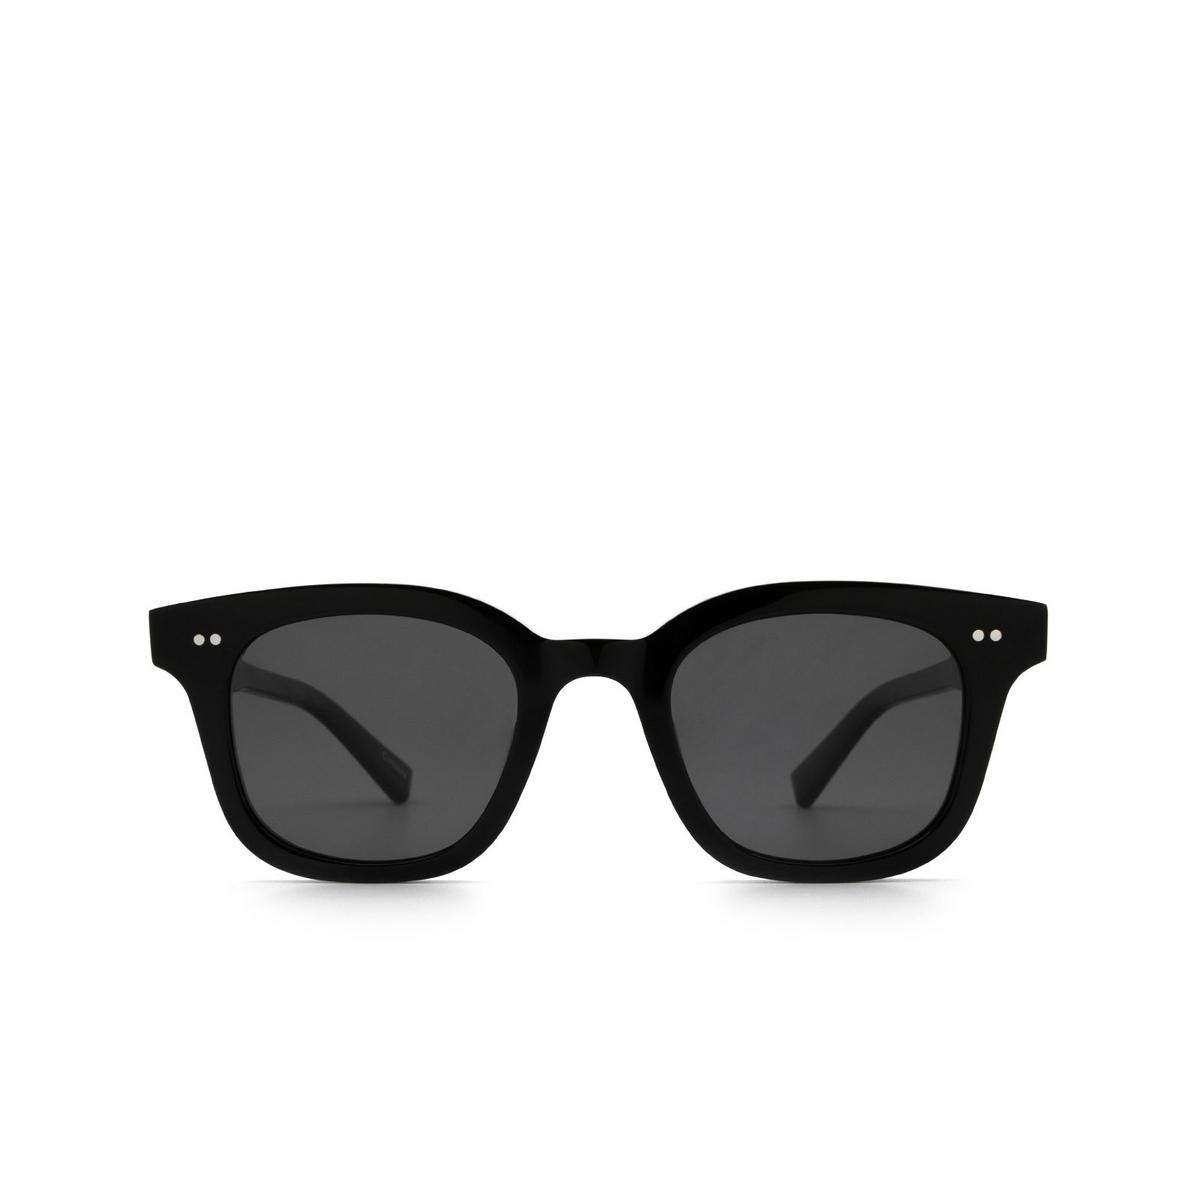 Chimi® Square Sunglasses: 02 color Black - front view.